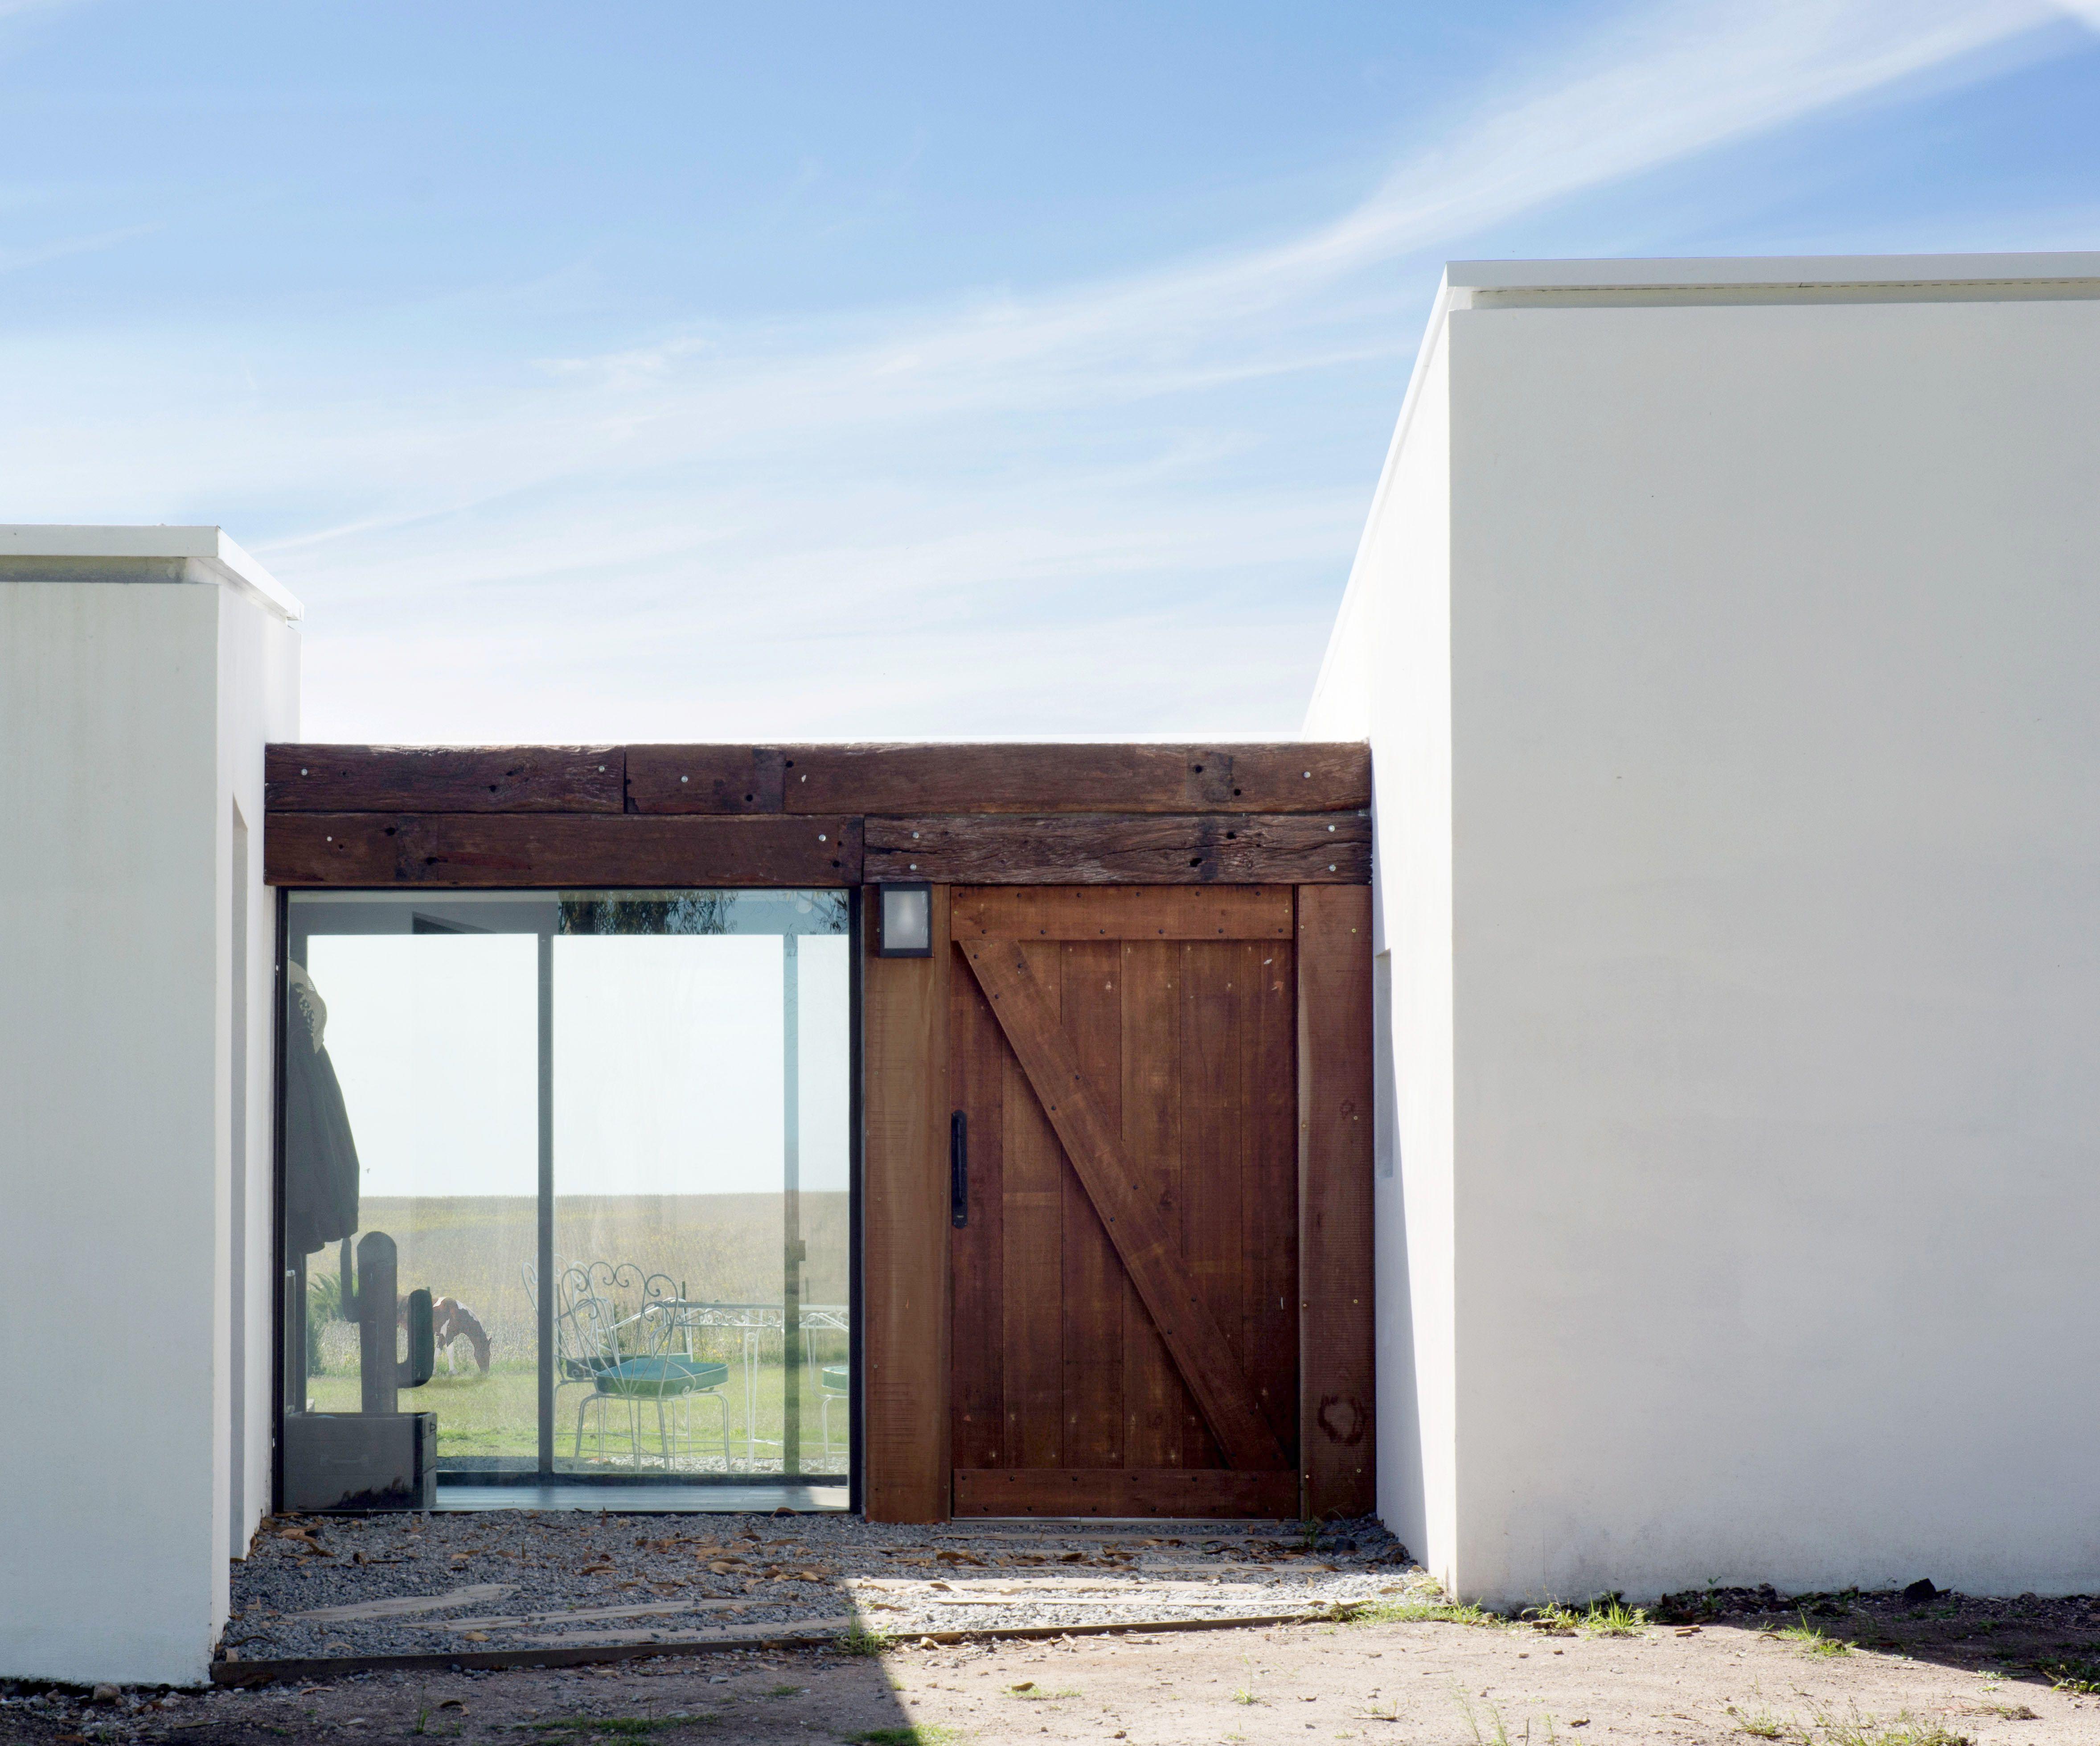 Casa de campo Los cardenales por Facundo Ochoa Arquitectura moderna